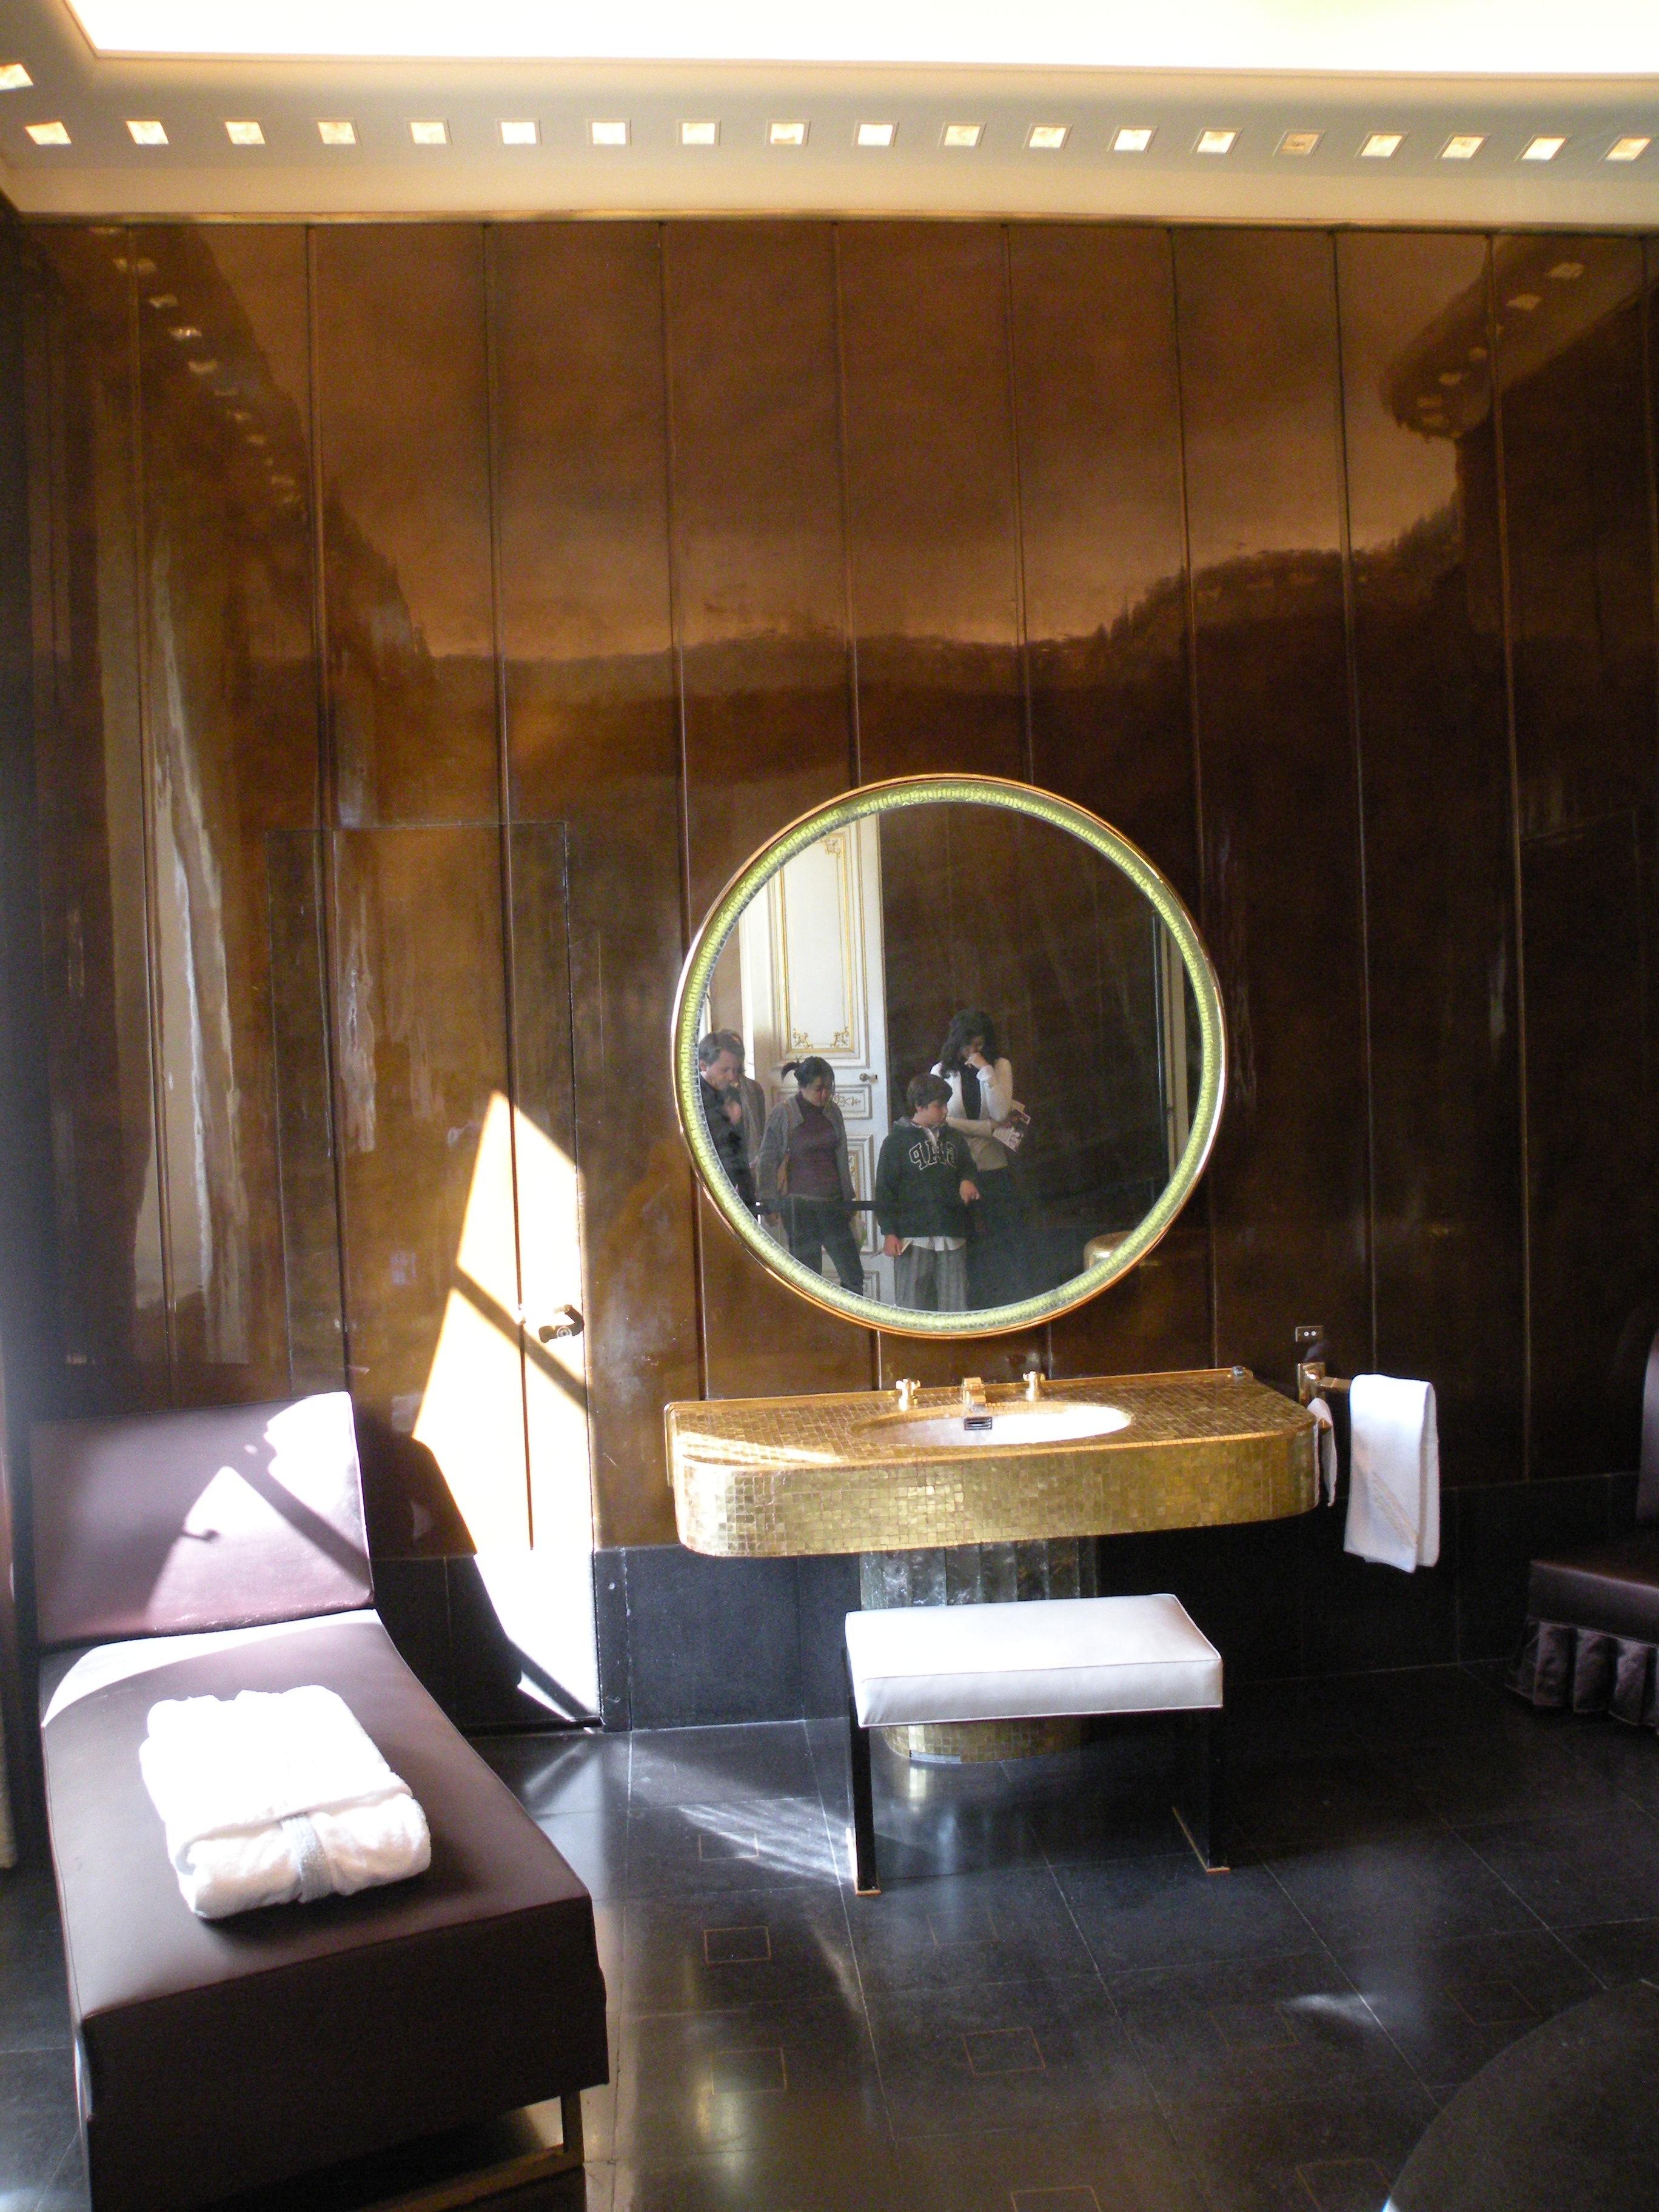 File 37 Quai D Orsay Salle De Bain Du Roi 1 Jpg Wikimedia Commons